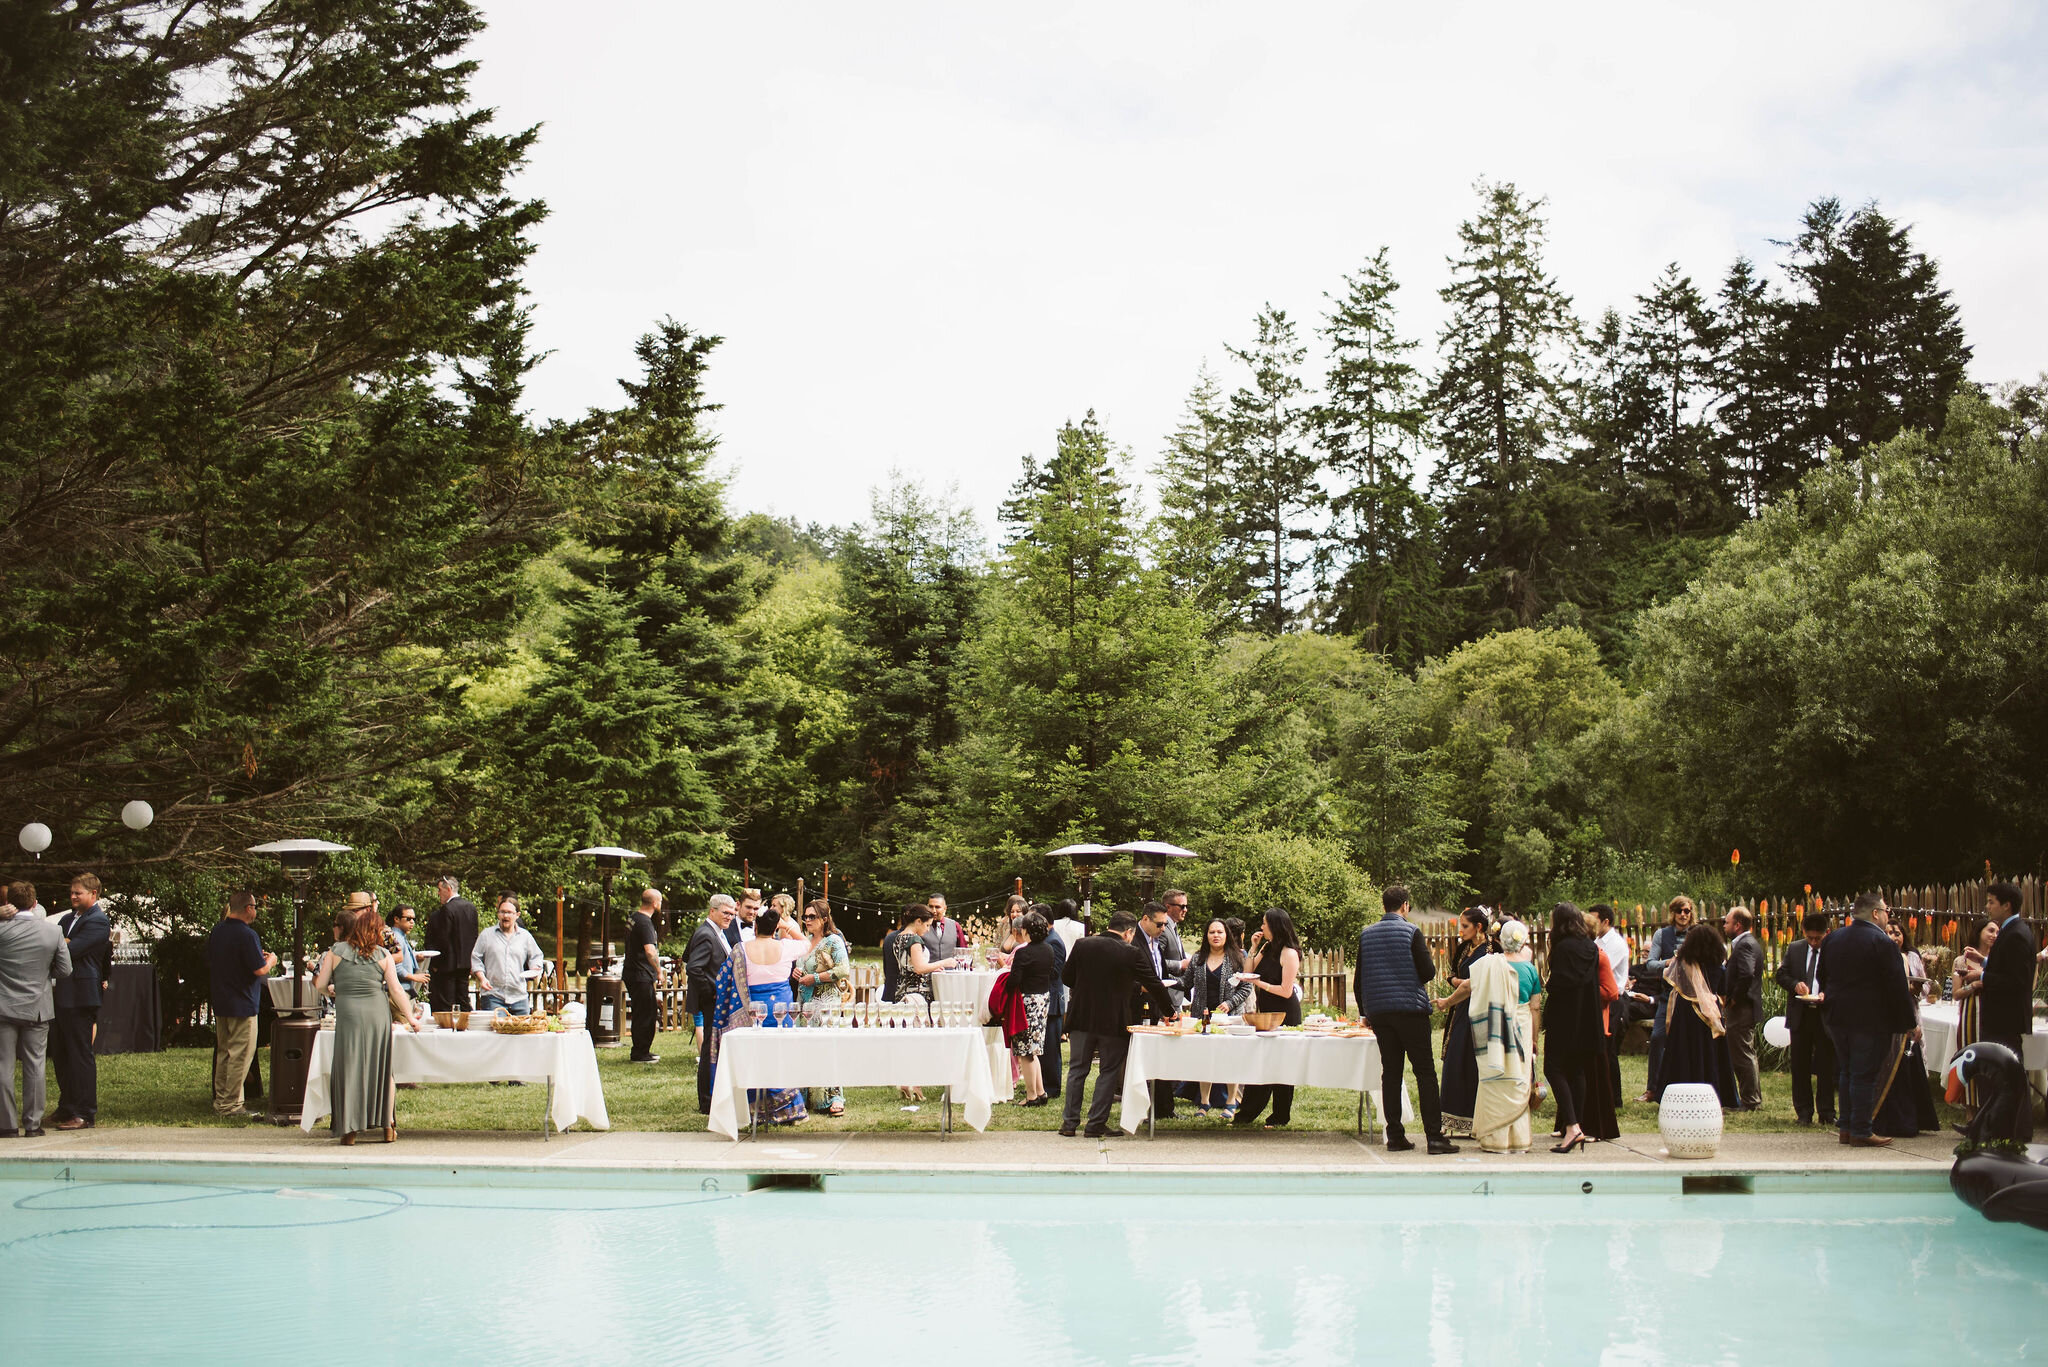 Venture-Retreat-Center-Wedding-Pescadero-Sat-Aaron-Pritam-The-Shalom-Imaginative-537.jpg